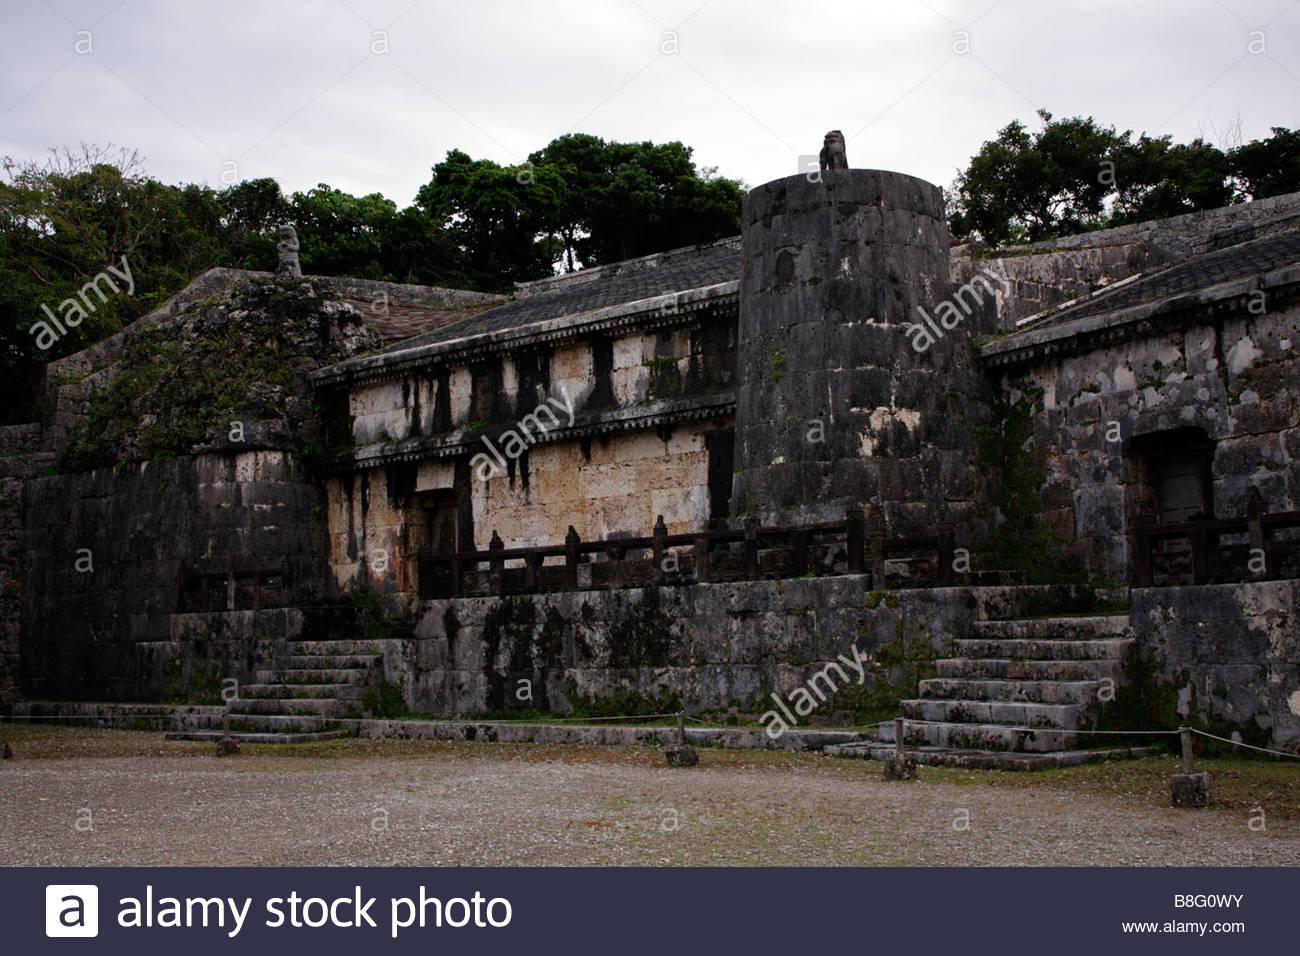 The Royal Mausoleum of the Sho-En dynasty, the Kings of Ryukyu, Okinawa, Japan - Stock Image